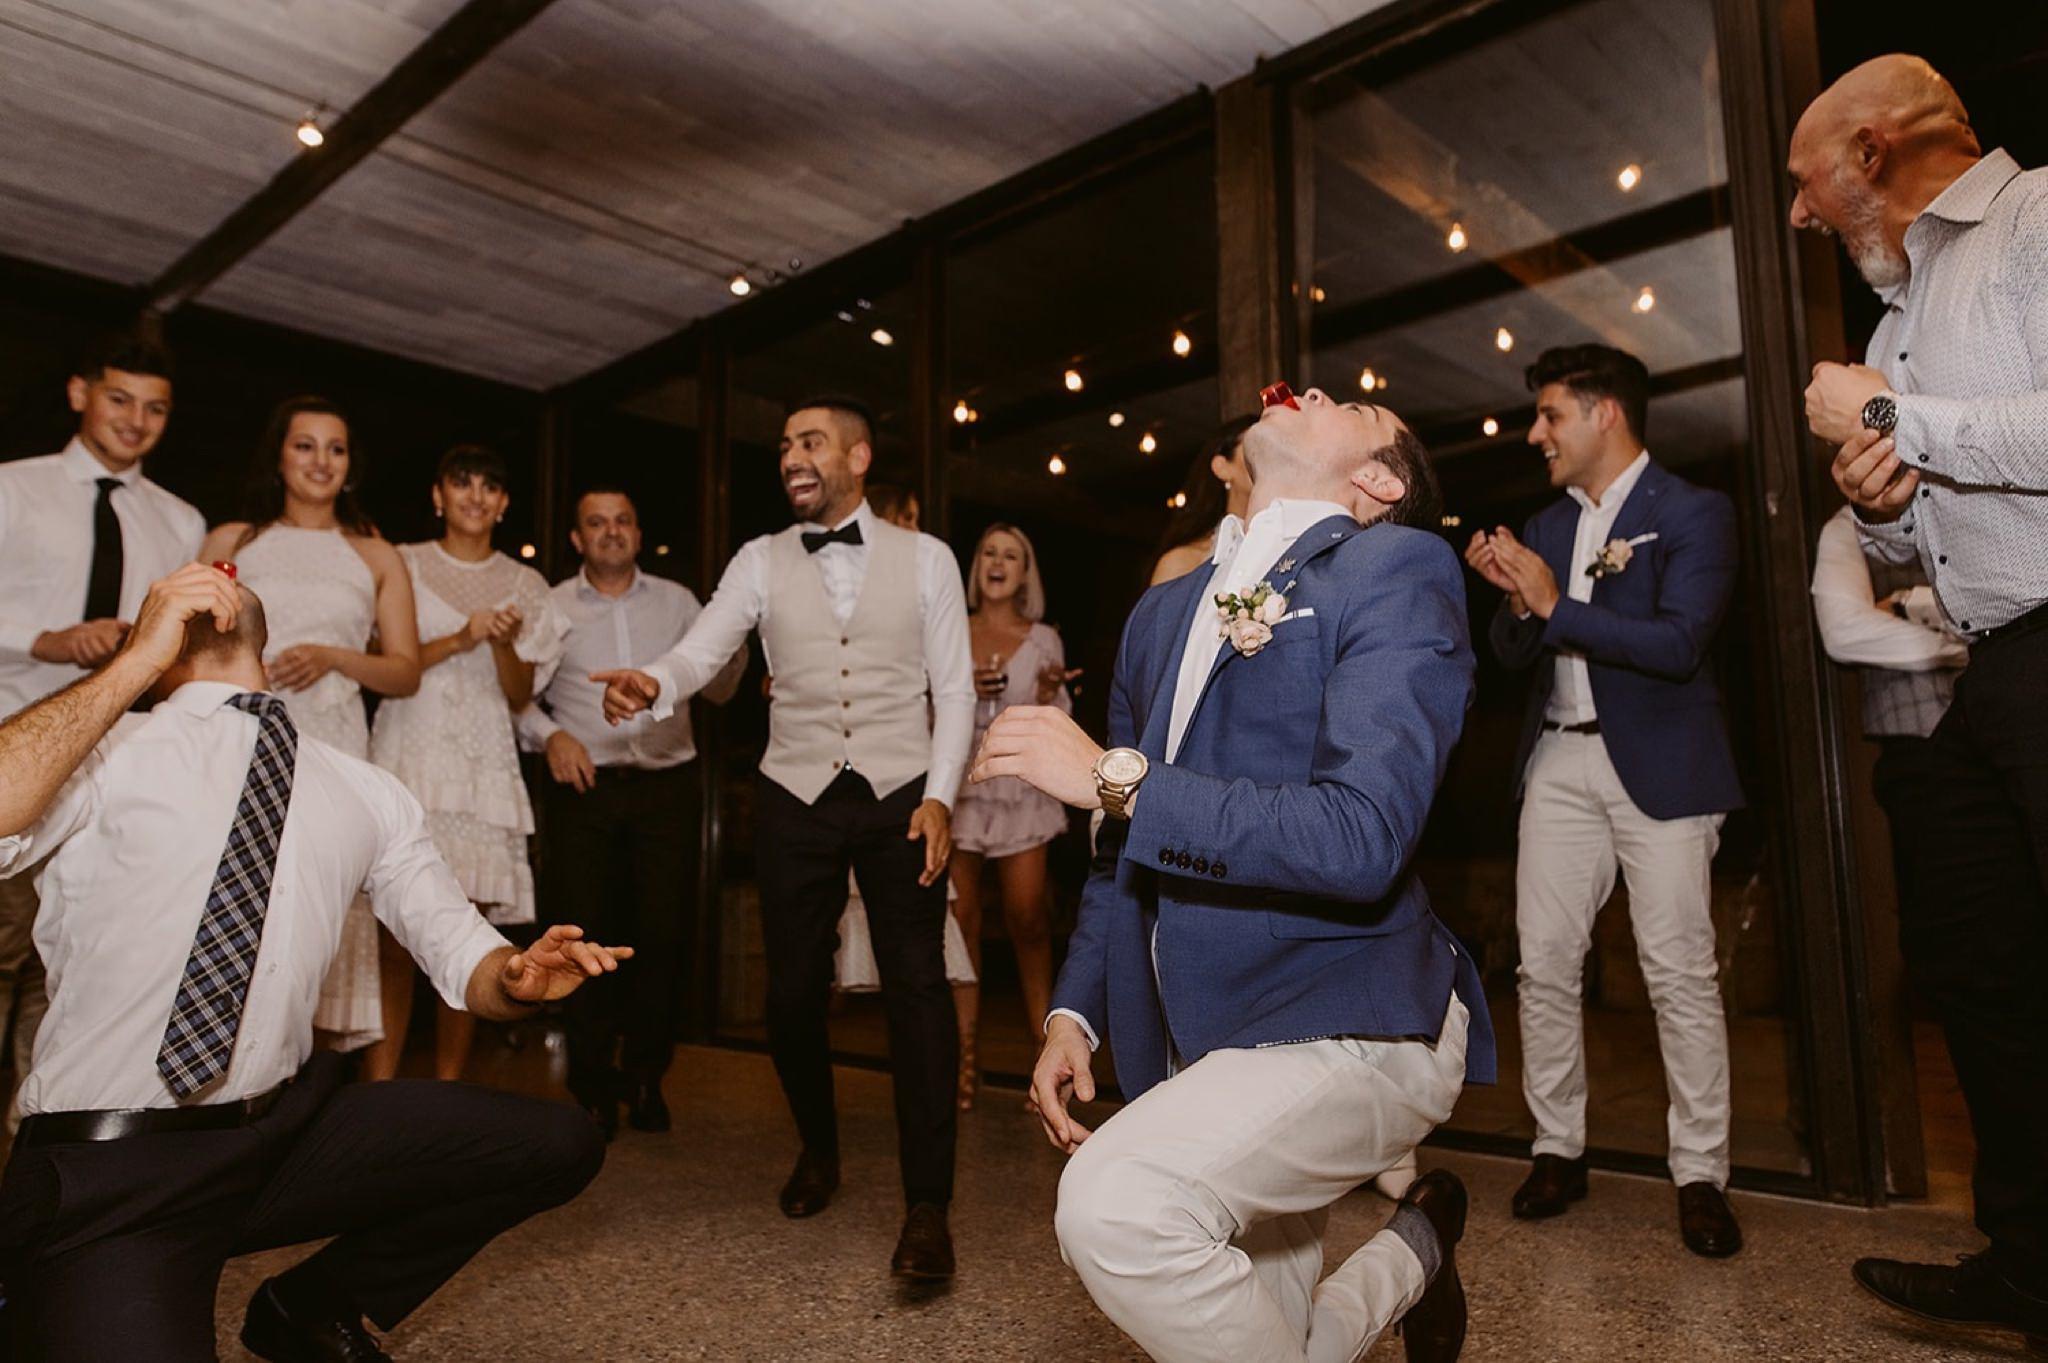 Stones of the Yarra Valley wedding photographer Ashleigh haase134.jpg